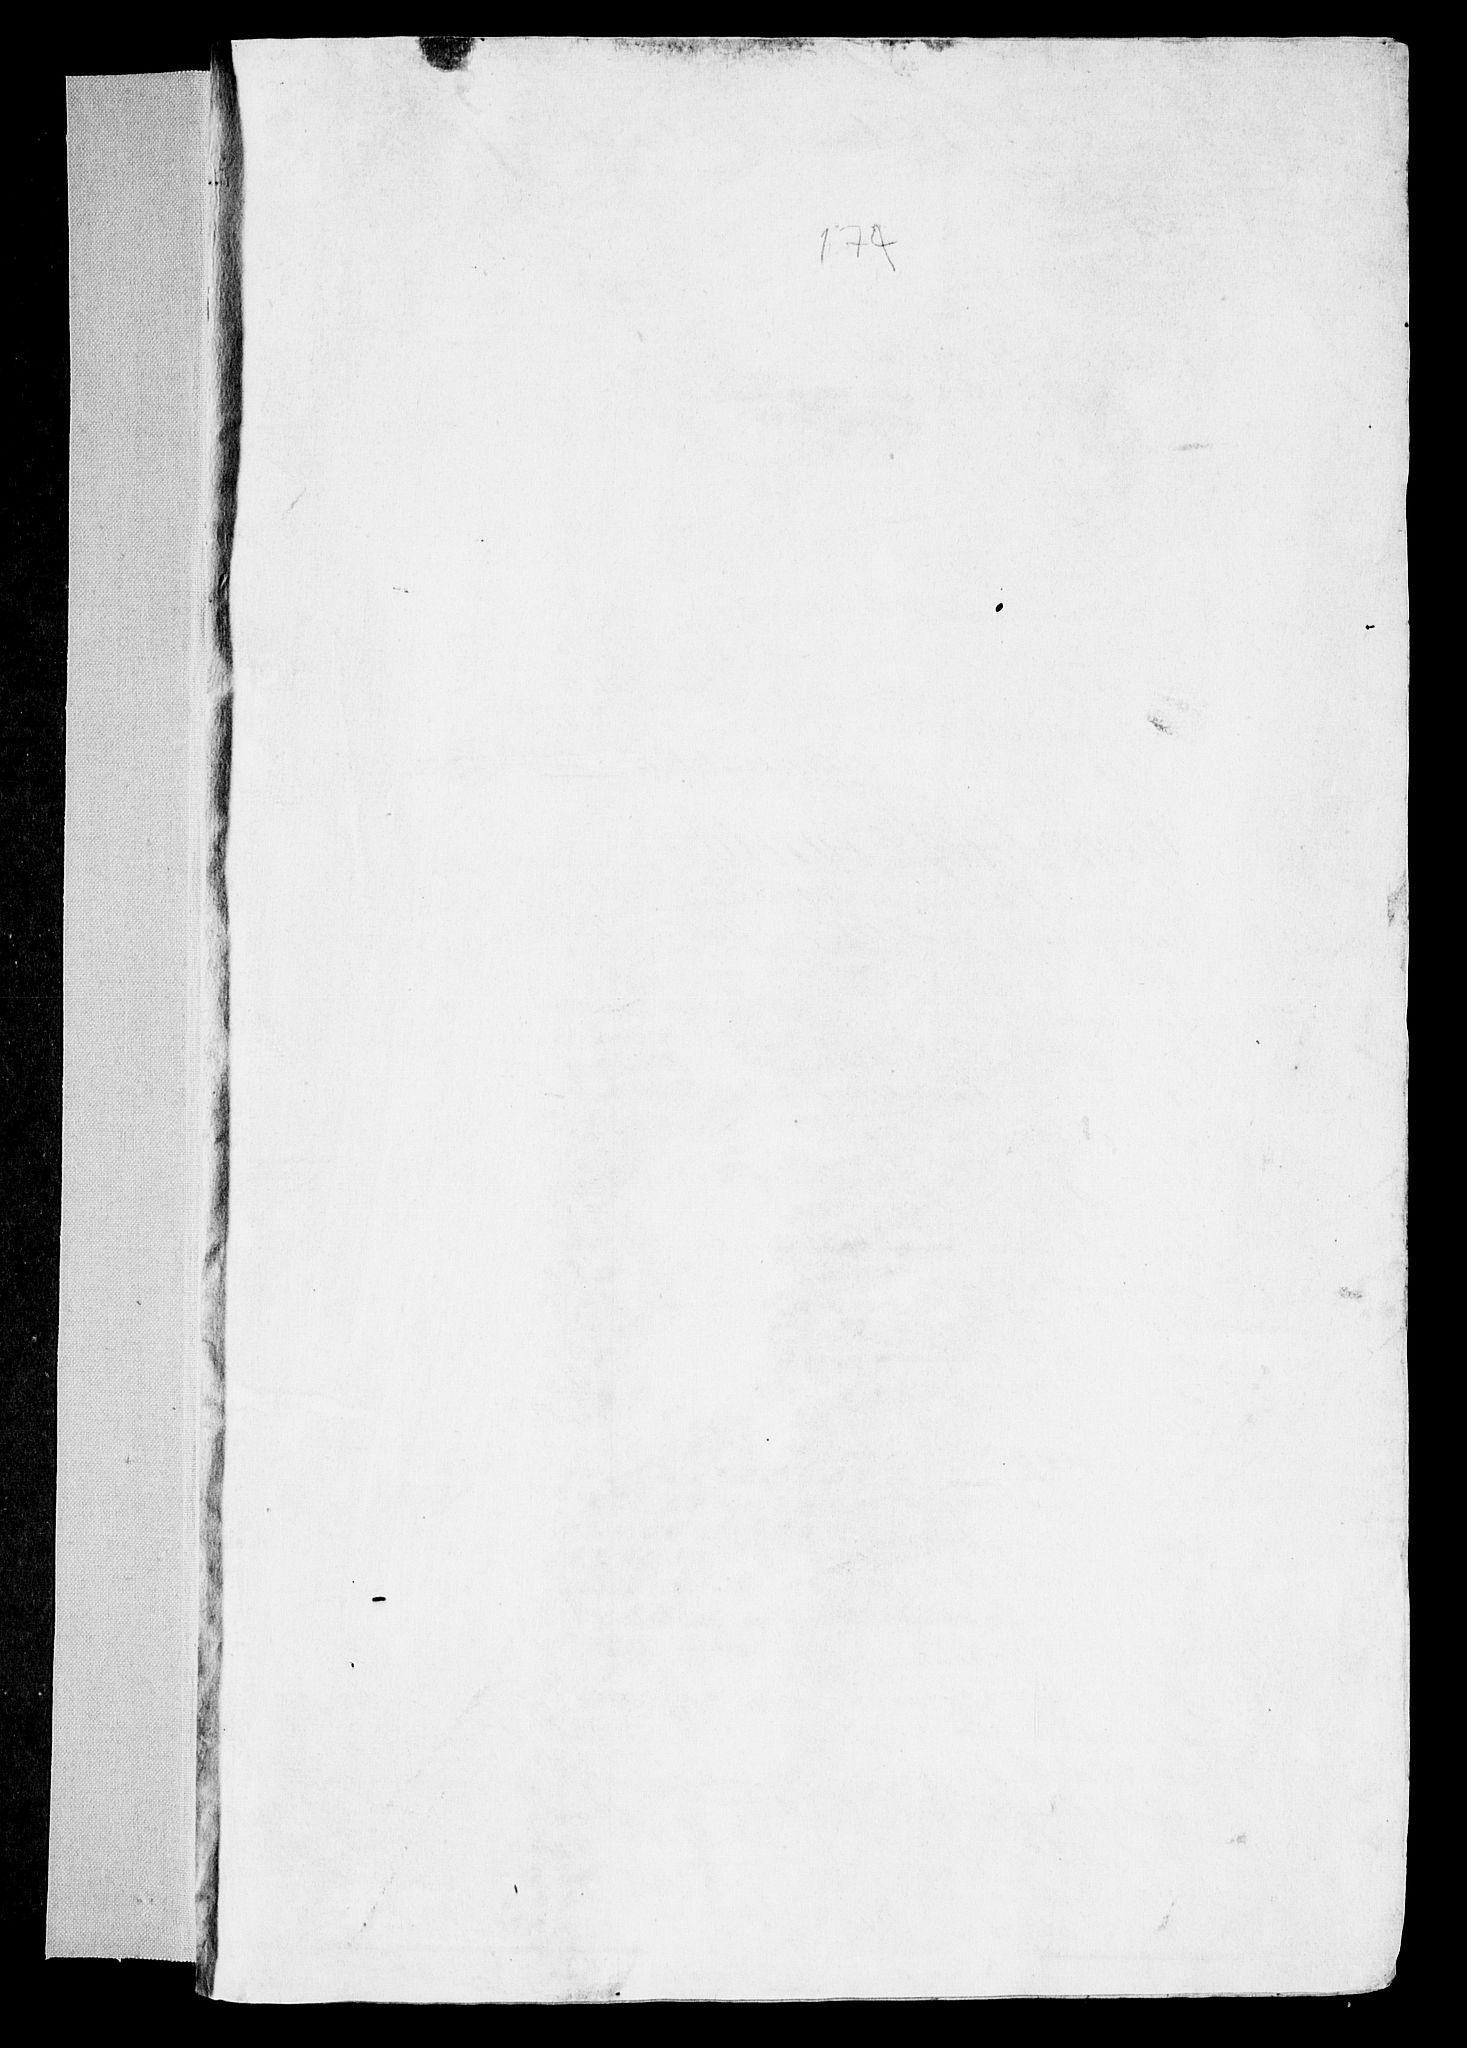 RA, Modums Blaafarveværk, G/Gd/Gda/L0174, 1833-1836, s. 2